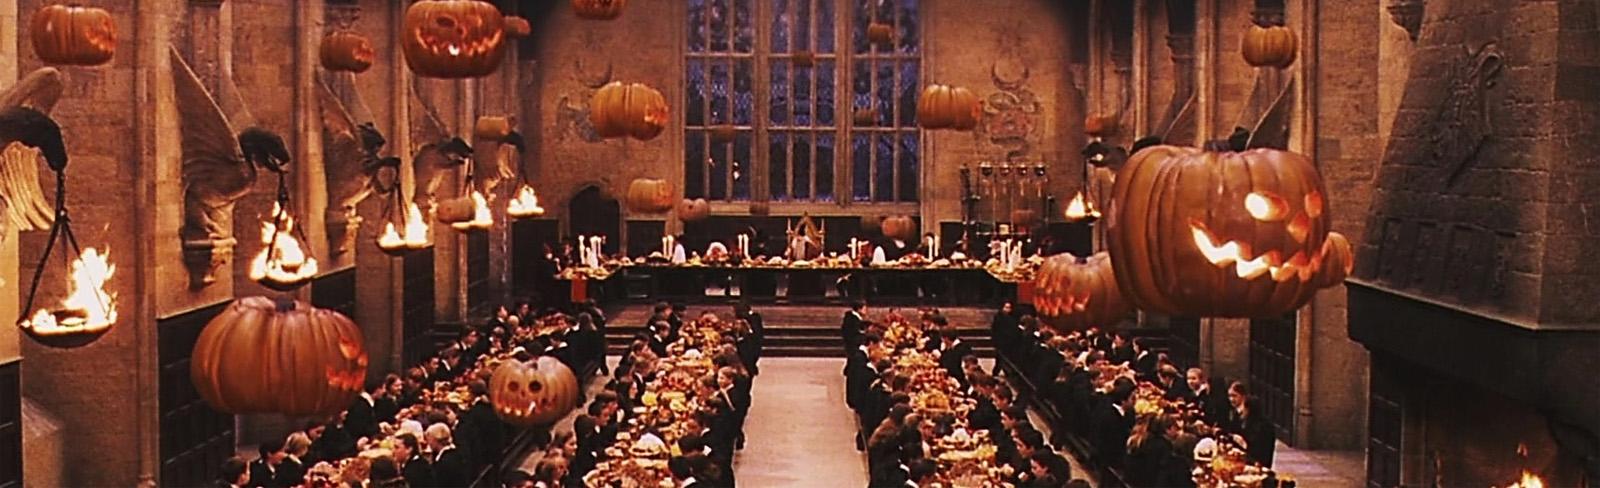 El gran comedor de hogwarts abre sus puertas en navidad for Comedor harry potter